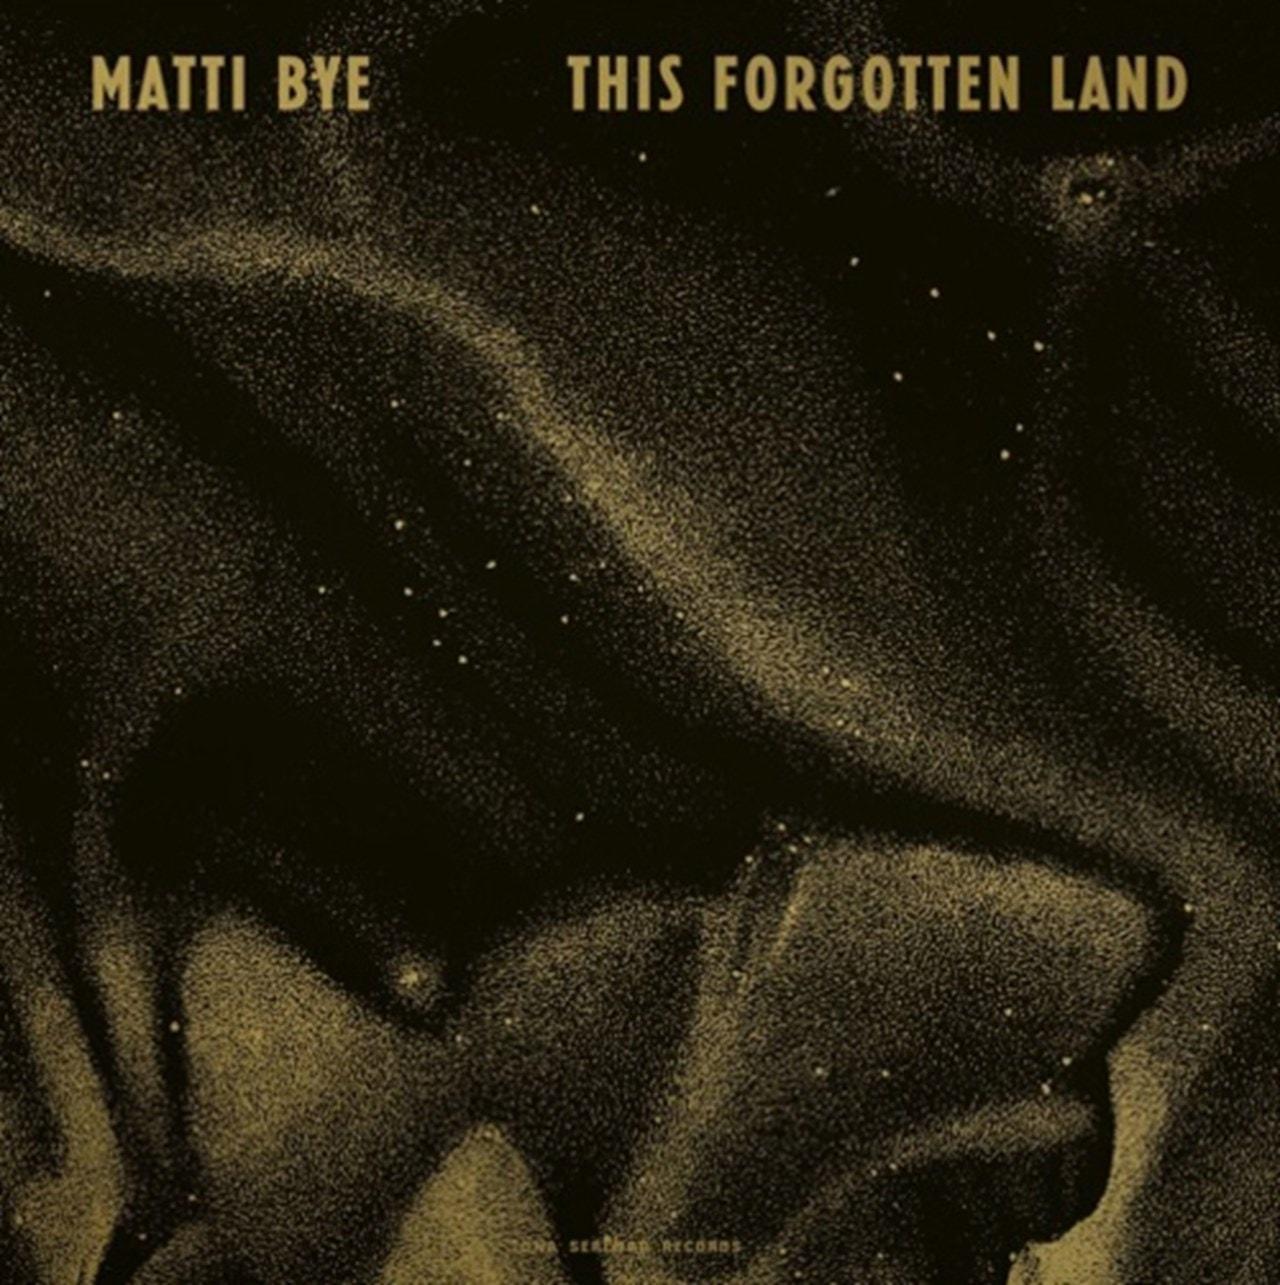 This Forgotten Land - 1